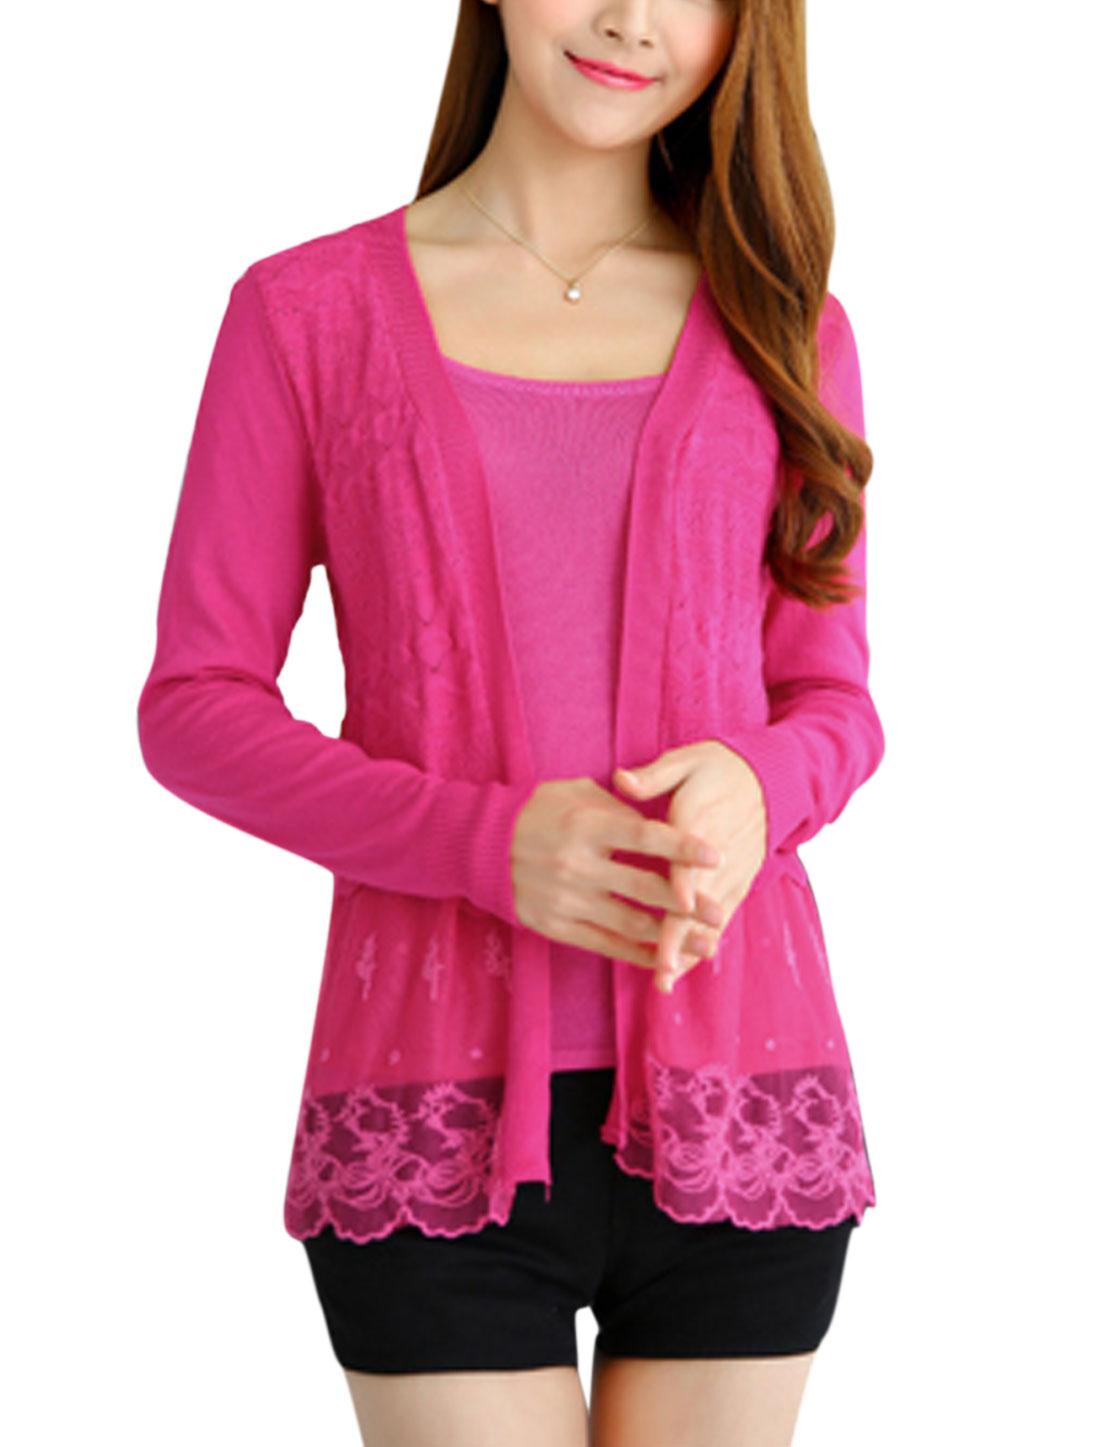 Women Long Sleeves Mesh Panel Embroidery Design Knit Cardigan Fuchsia XS